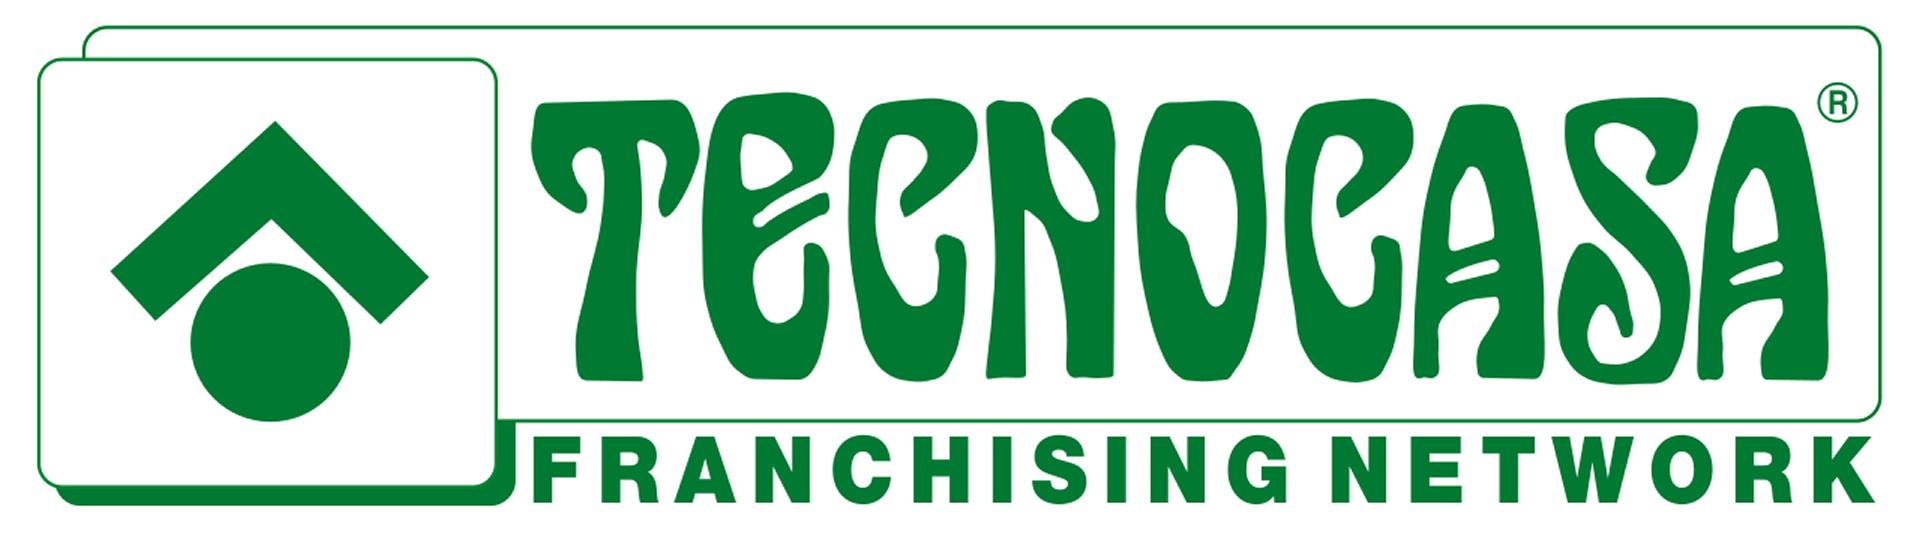 Affiliato Tecnocasa: studio immobiliare torrino s. R. L.